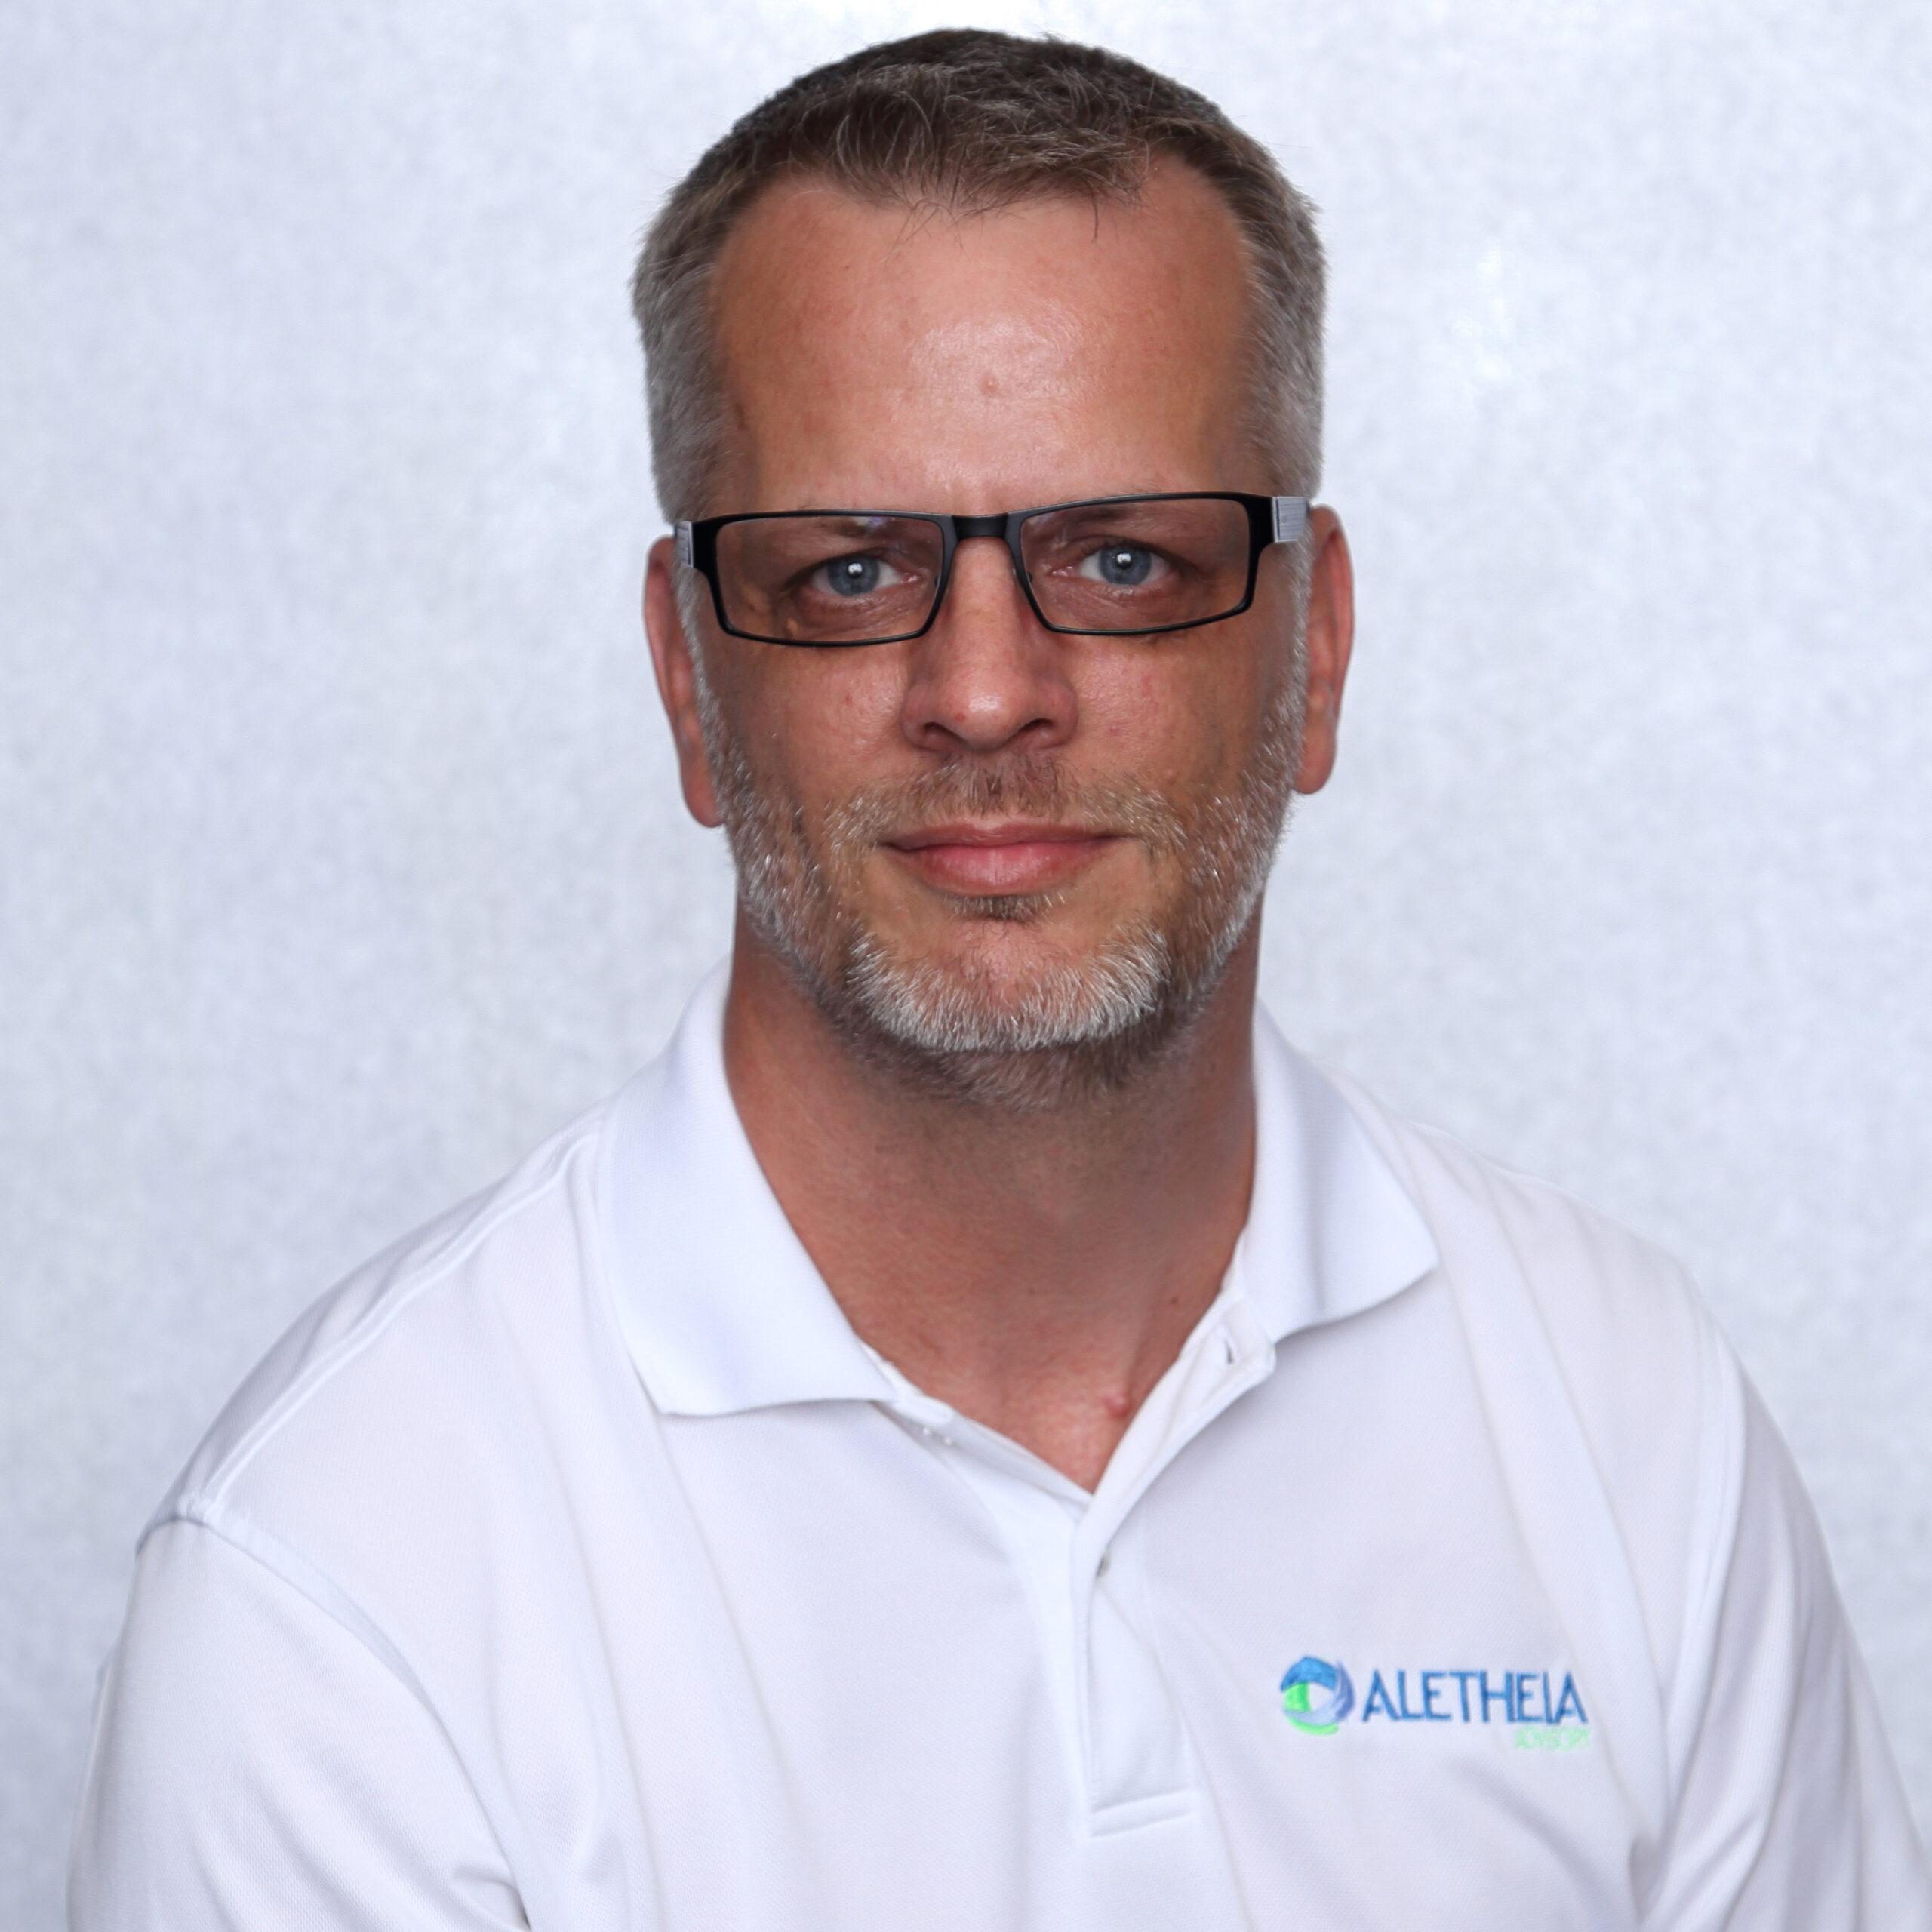 Terry Corley, Chief Executive Officer & Principal Advisor